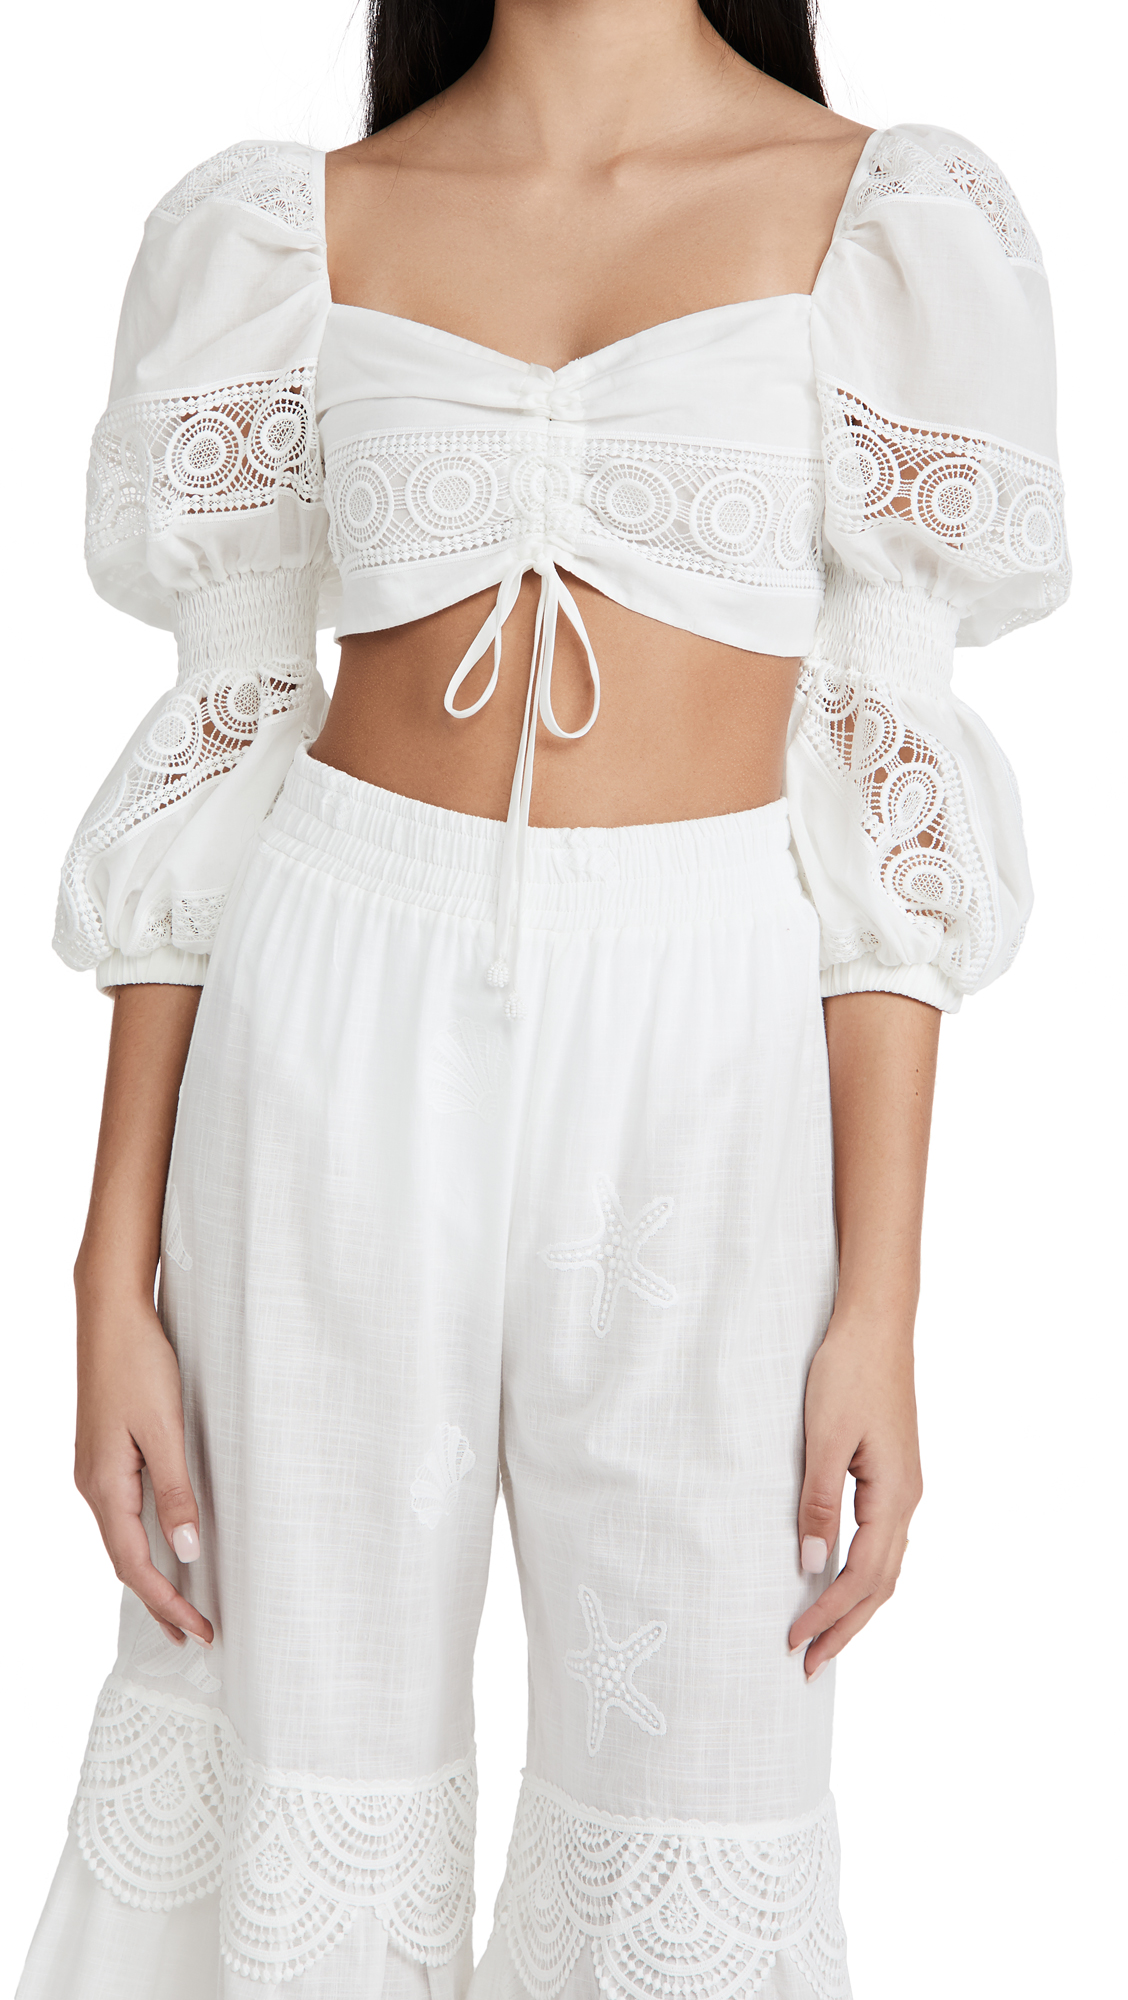 Waimari Sevillana Top White